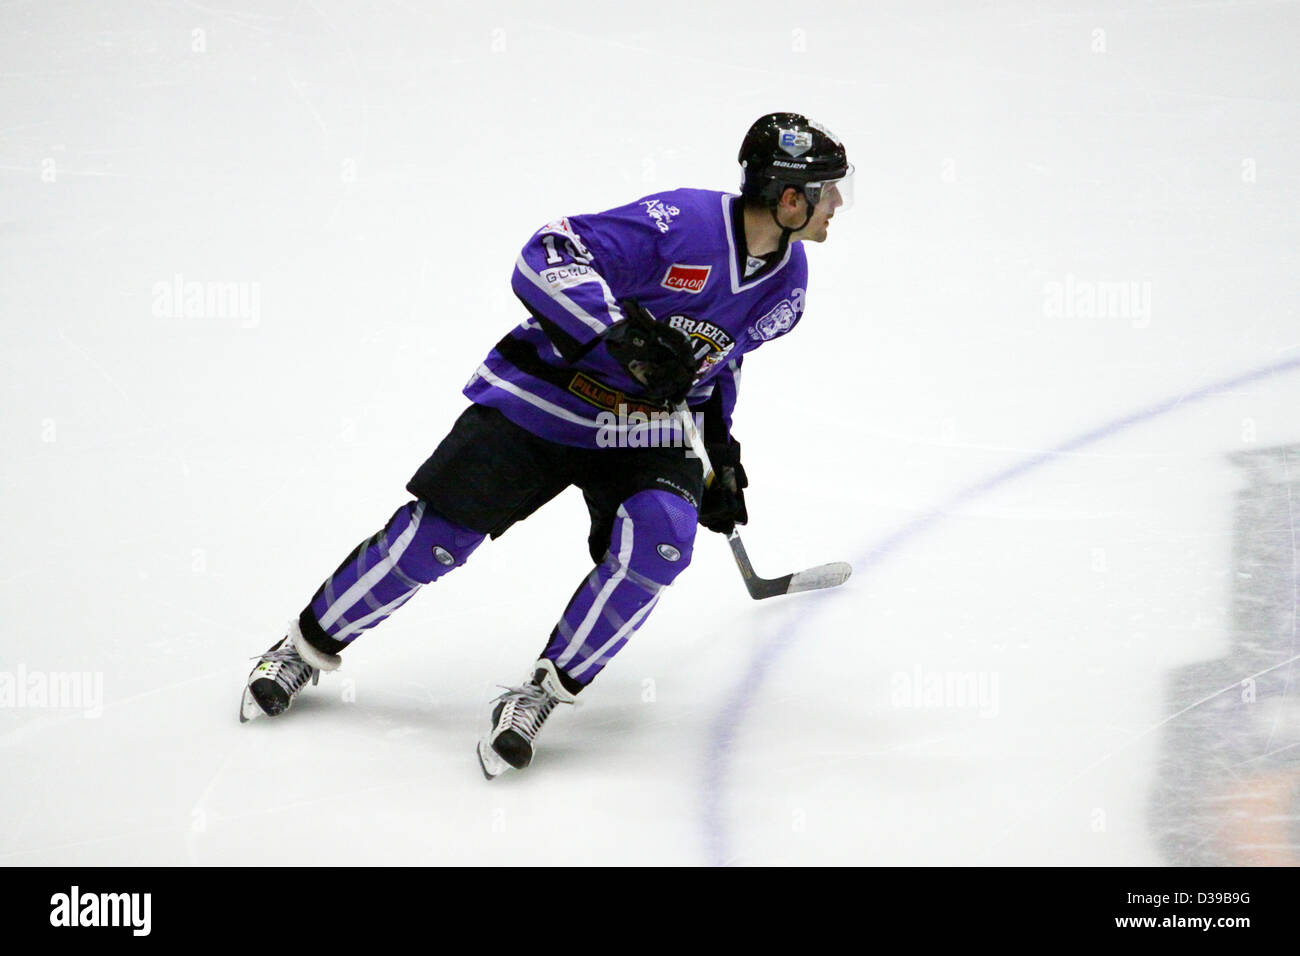 Glasgow, Scotland, UK. 13th February 2013. Elite Ice Hockey League Braehead Clan v Hull Stingrays Braehead Arena. - Stock Image